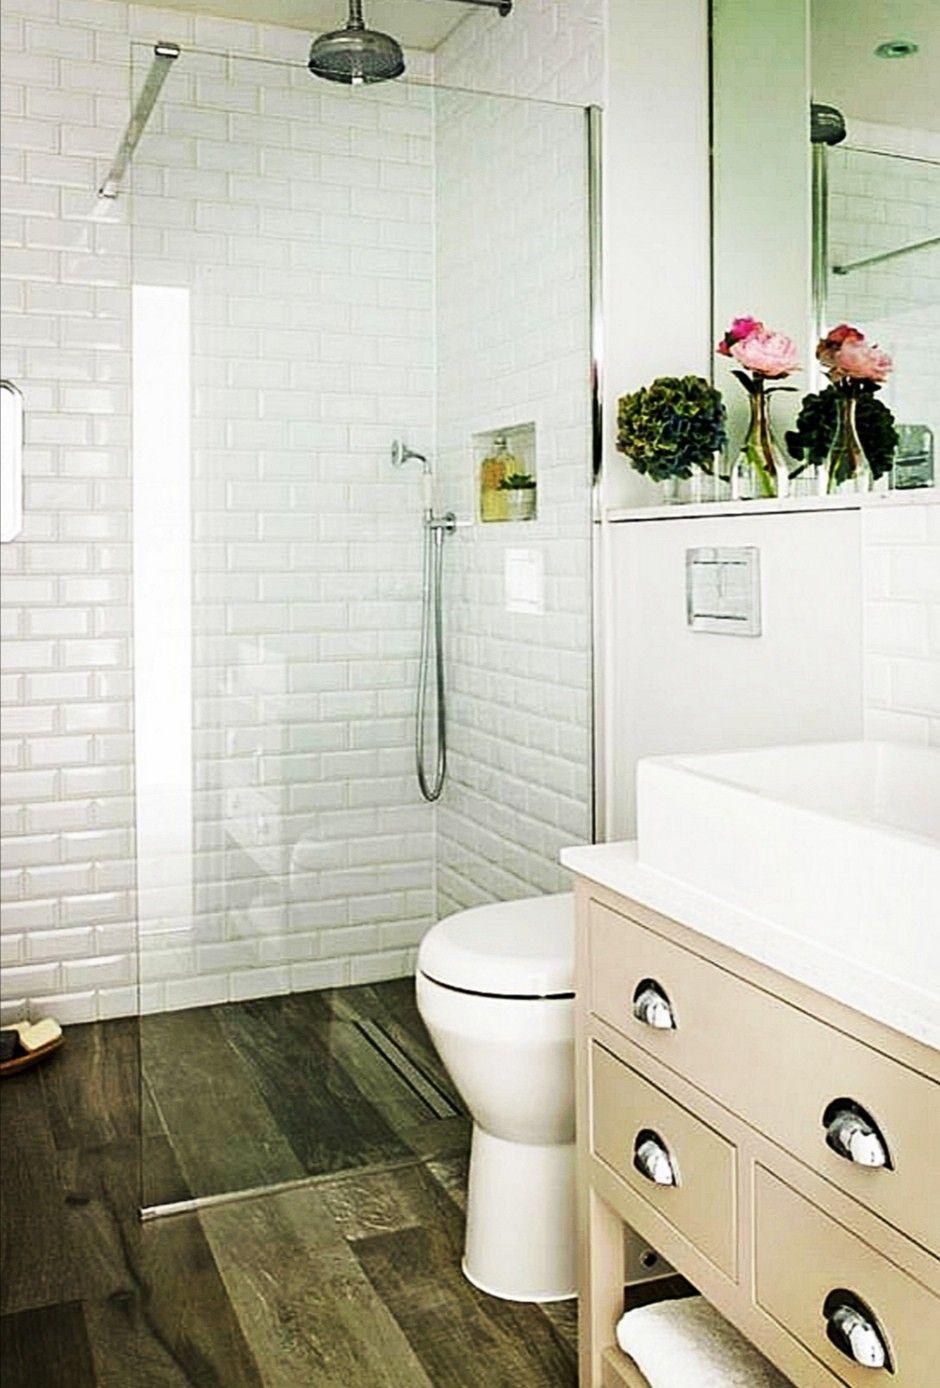 Pin By Stacia Aman On Interer In 2020 Basement Bathroom Remodeling Master Bathroom Shower Bathrooms Remodel